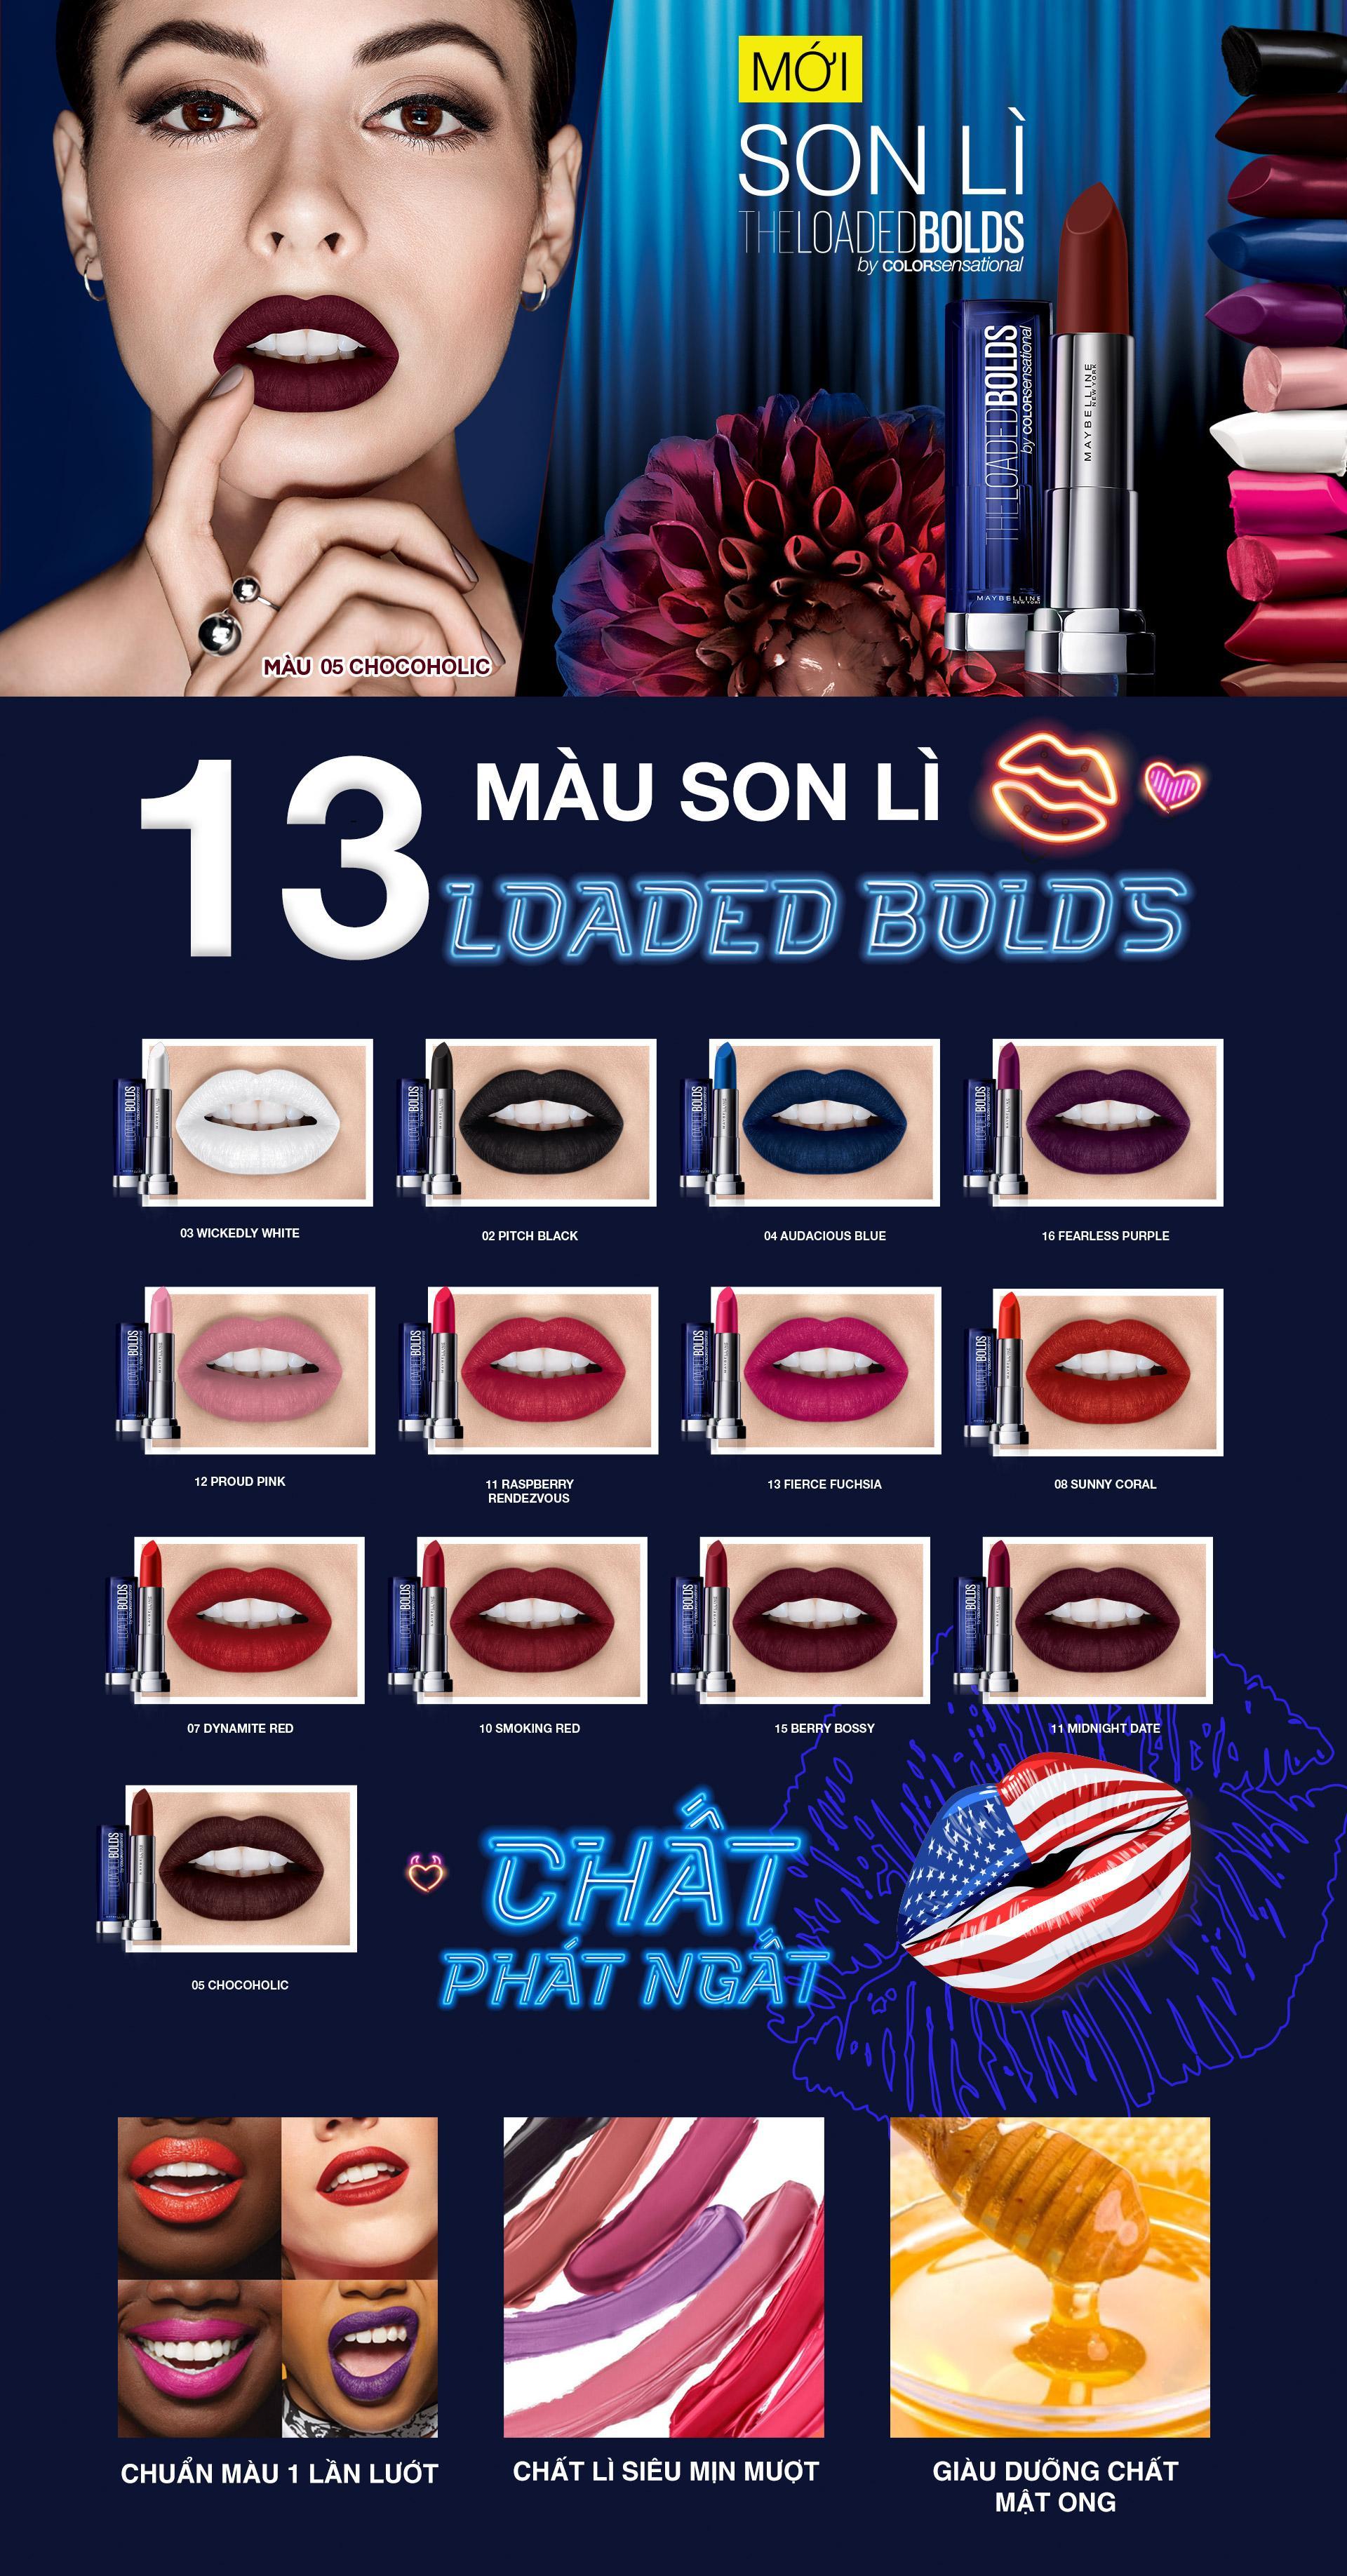 ContentPage_MBL_Loaded-Bolds.jpg